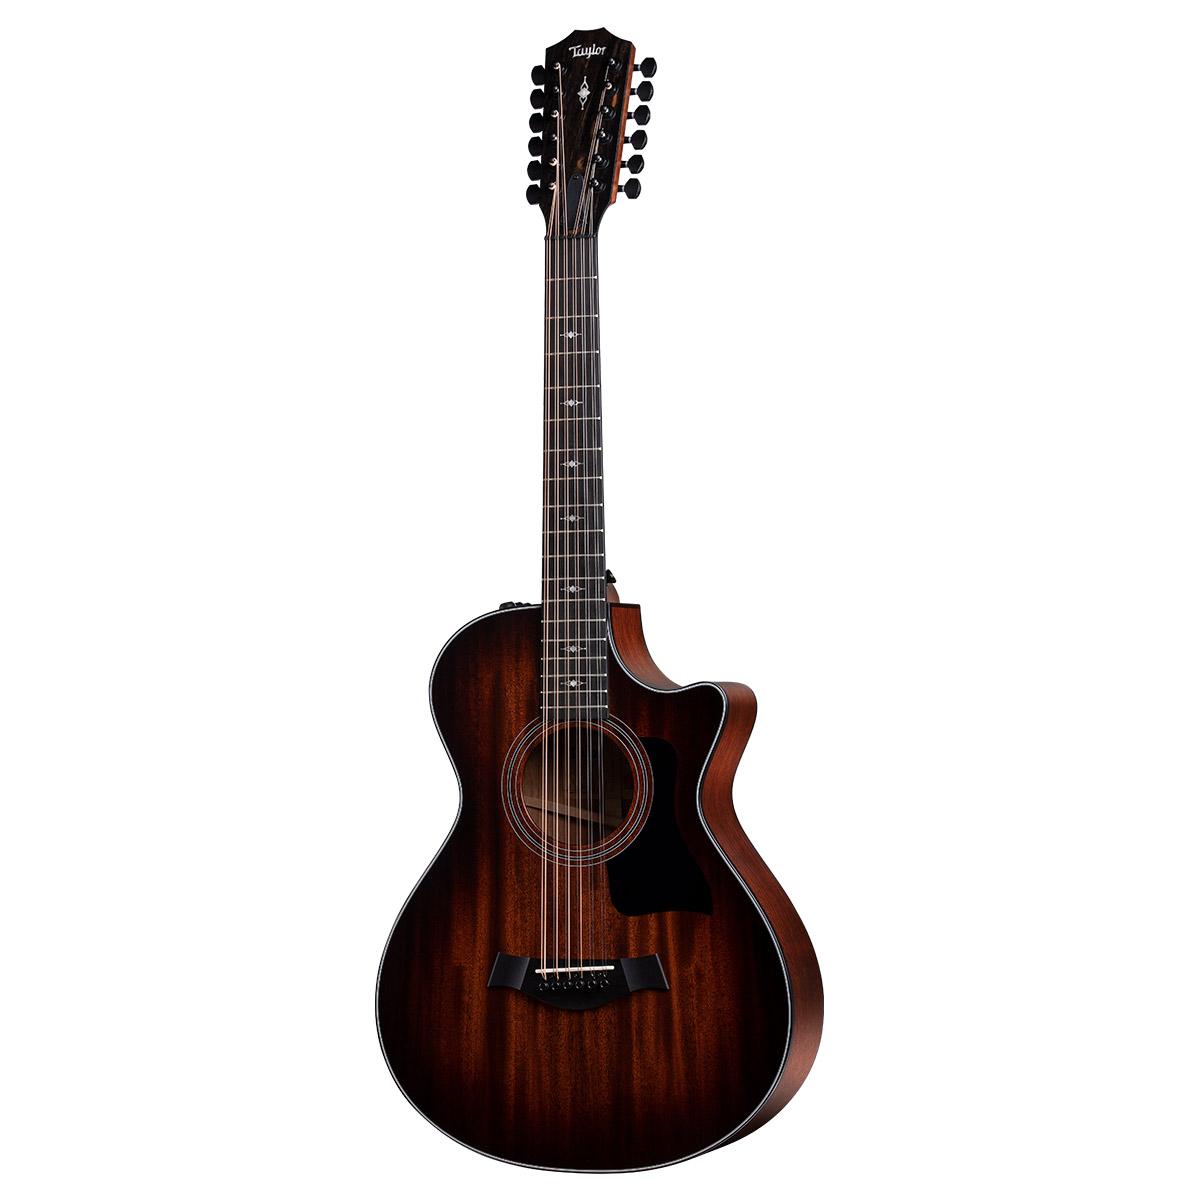 Taylor 362ce western-guitar